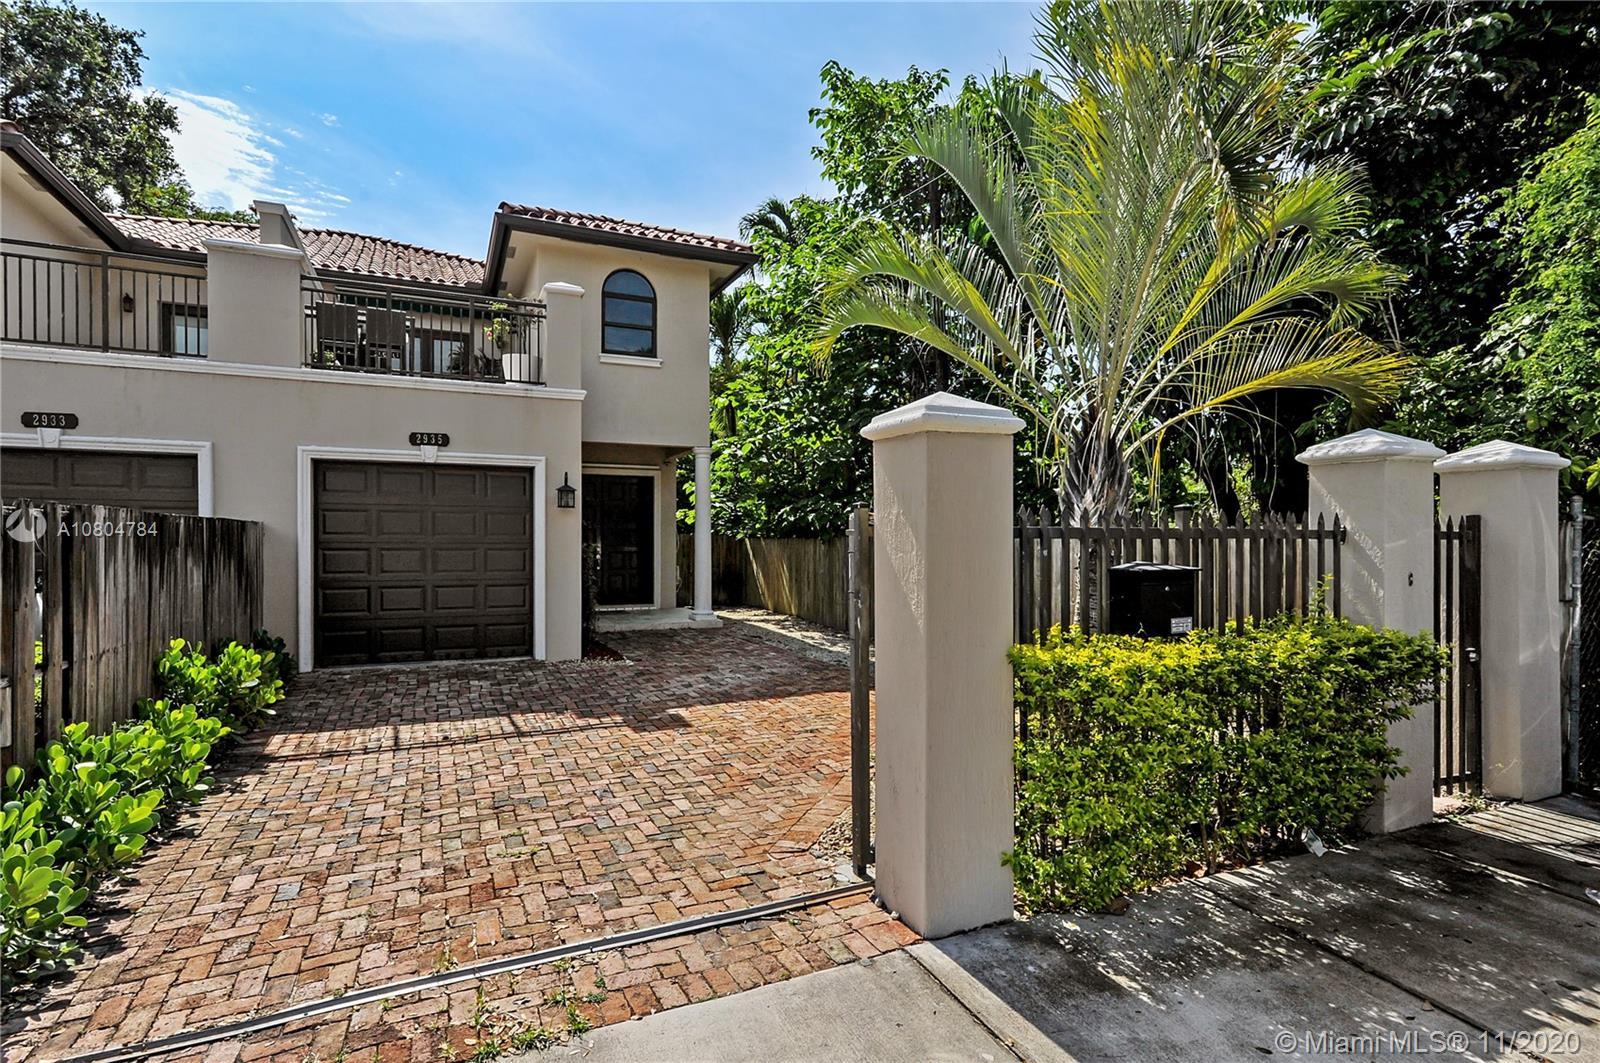 2935 Virginia St, 2935 - Miami, Florida